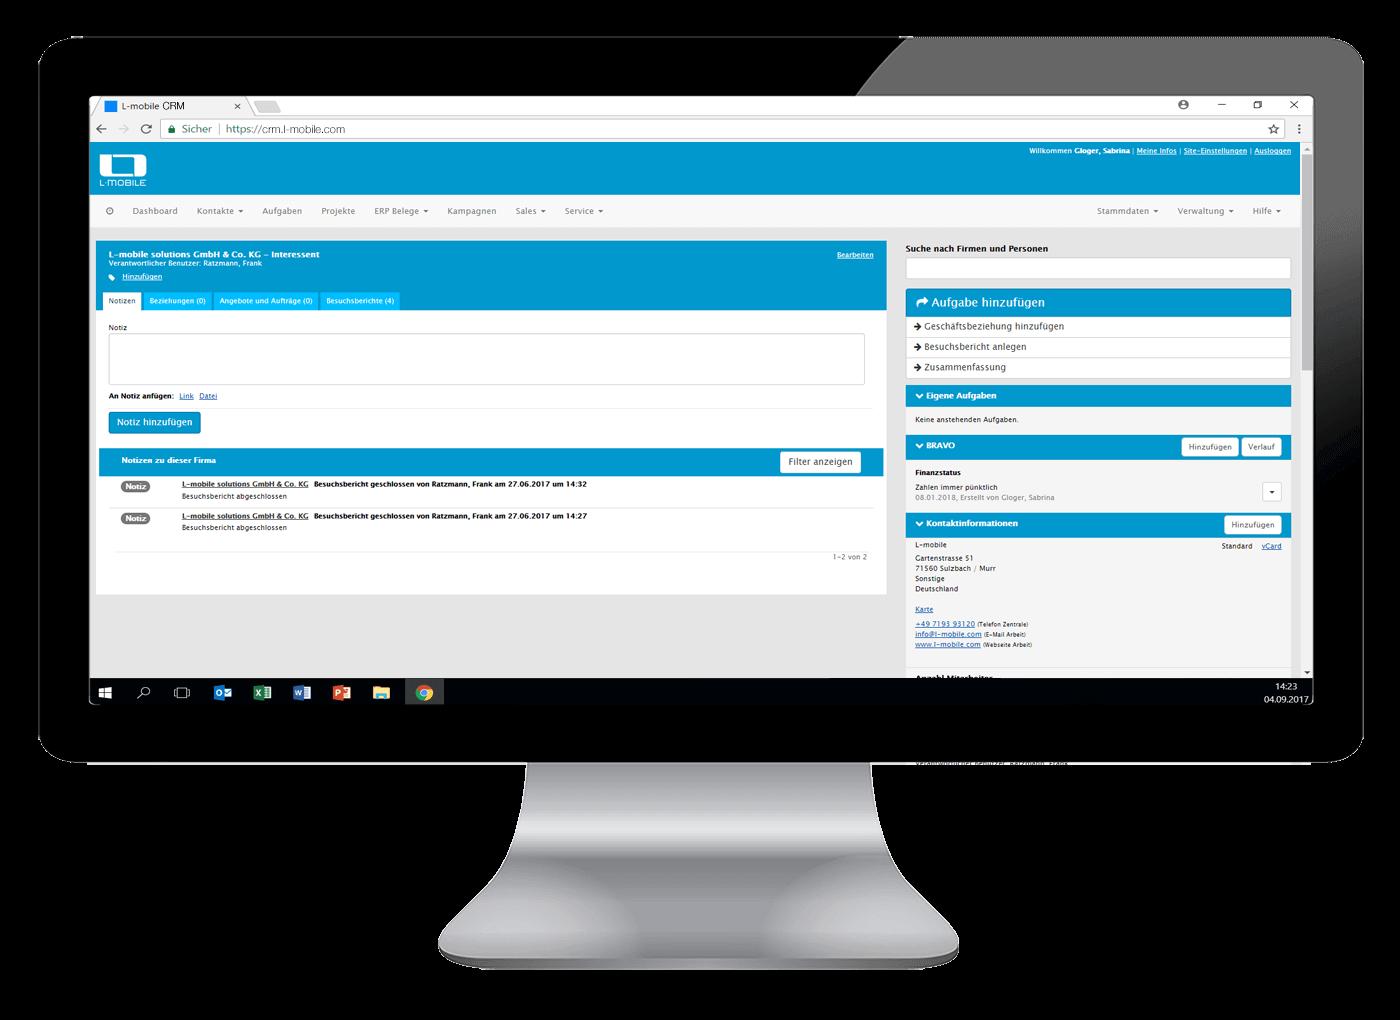 L-mobile mobile Softwarelösungen Produkt Mobiler Vertrieb sales Bildschirm